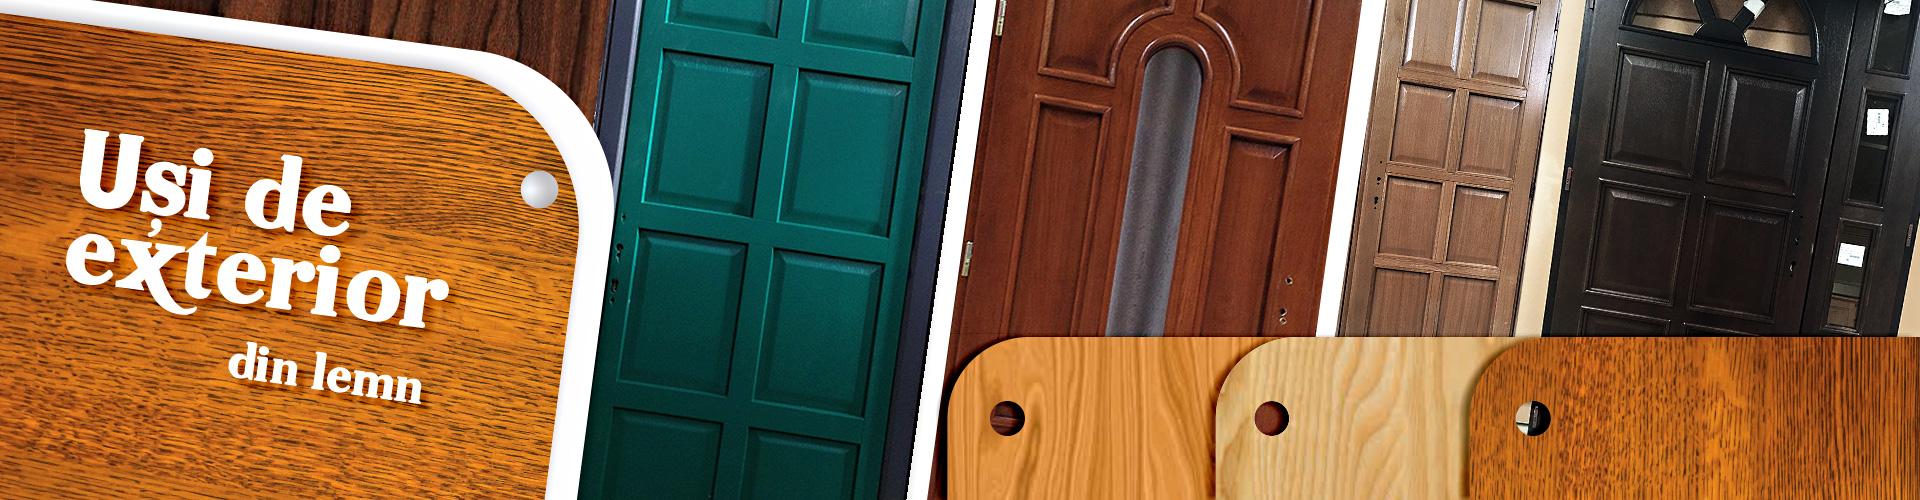 usi de exterior din lemn